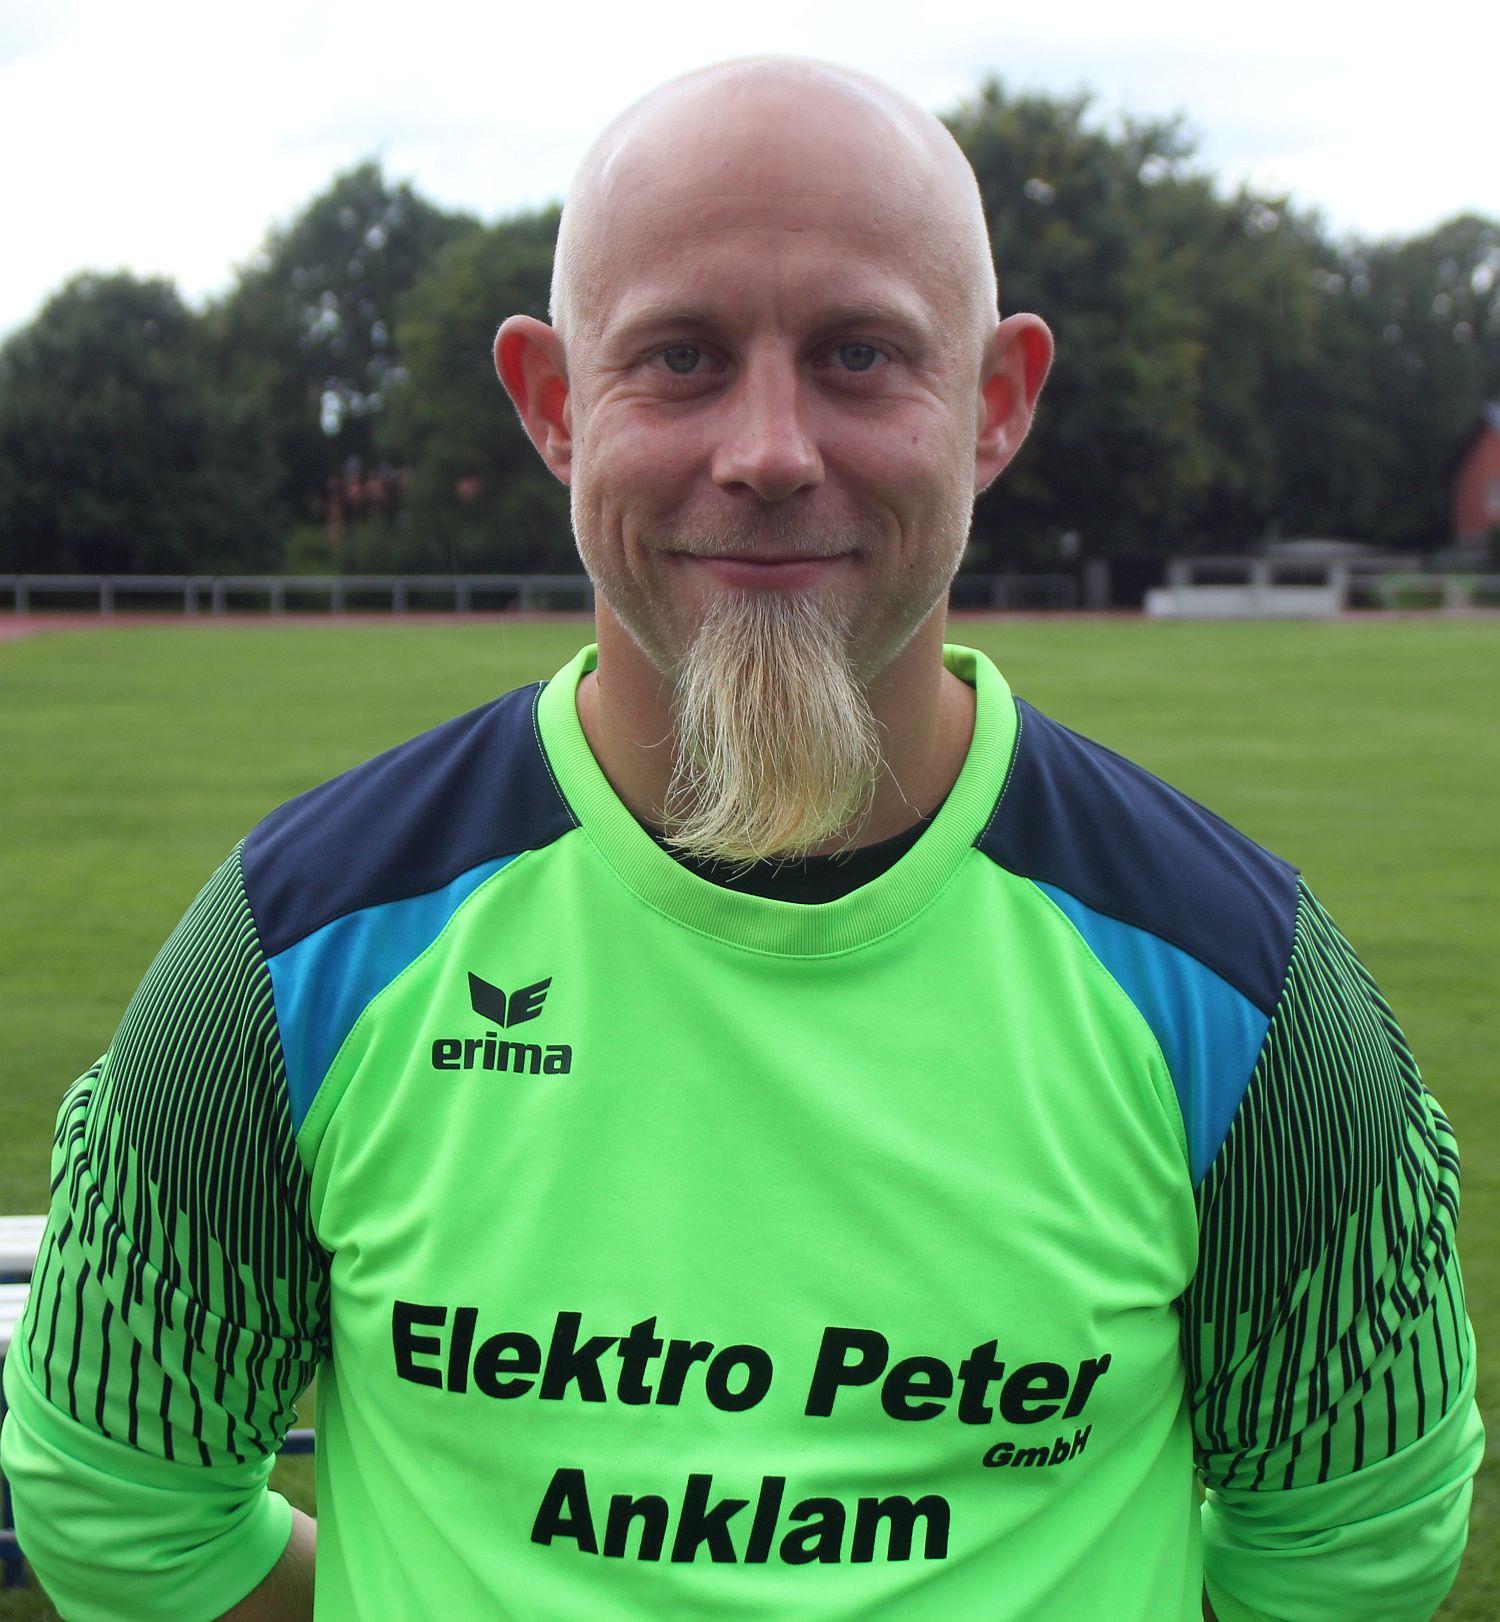 Philipp Labahn